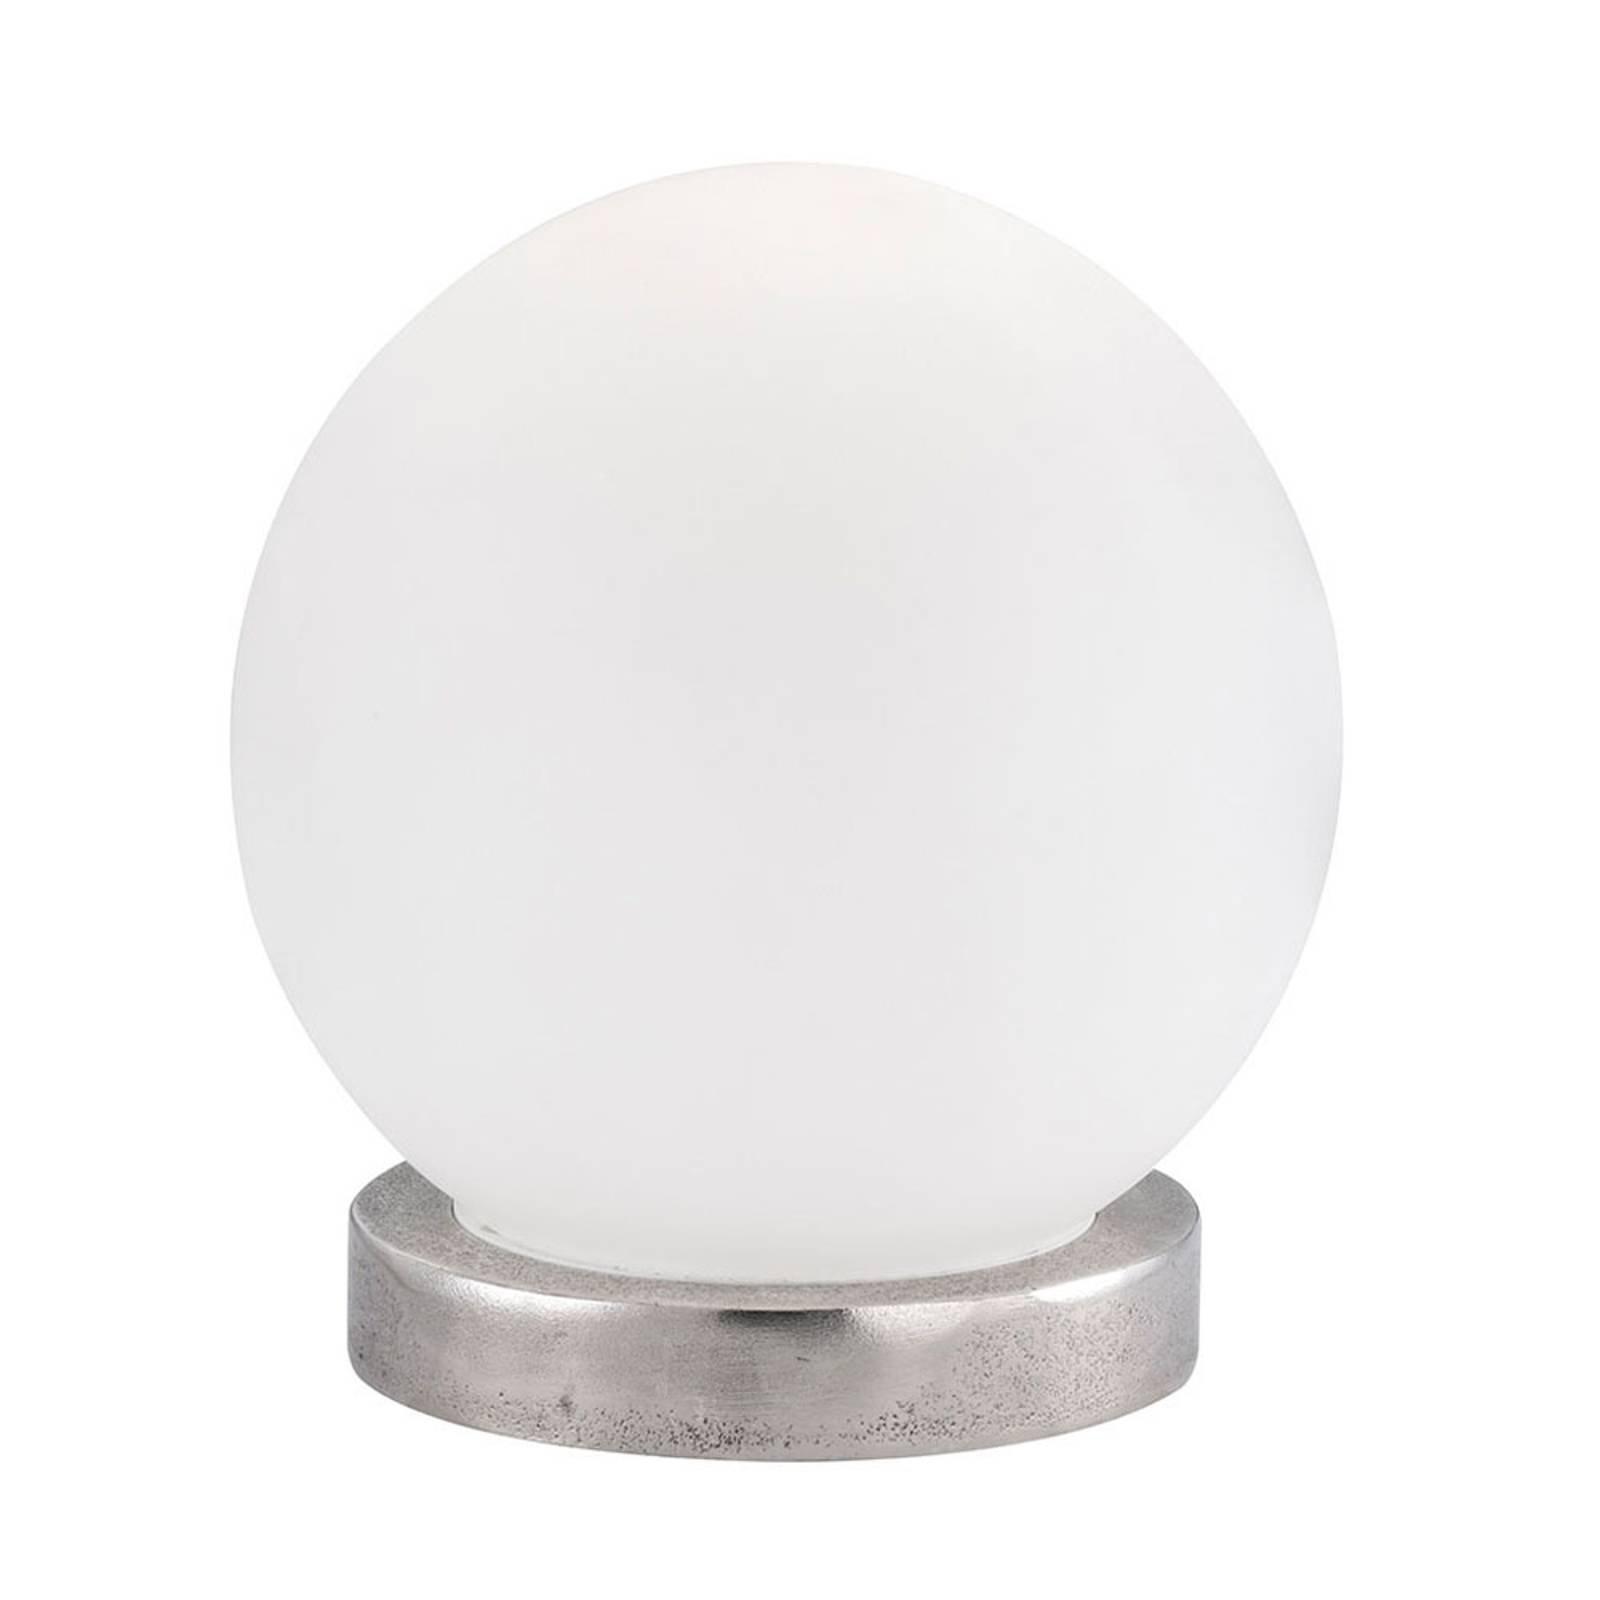 Bordlampe Antony, opal kule, fot nikkel, Ø25cm